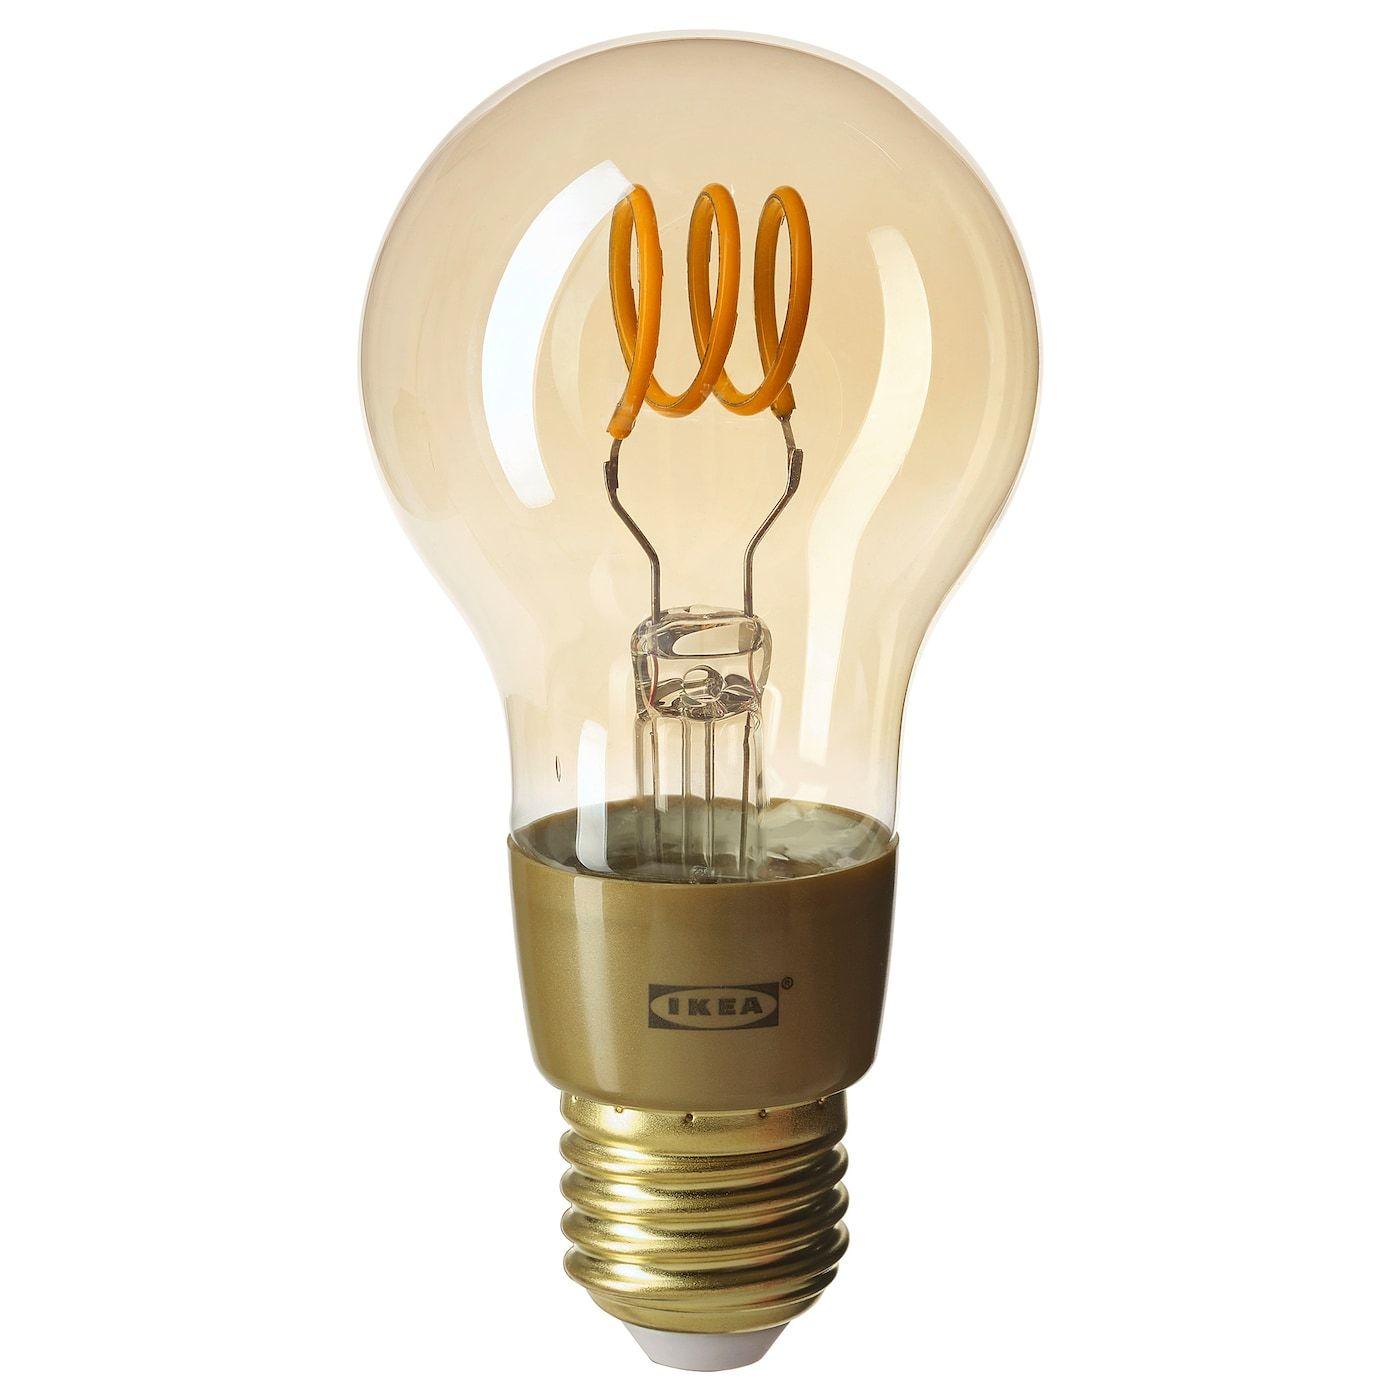 Tradfri Bombilla Led E27 250 Lumenes In 2020 Clear Light Bulbs